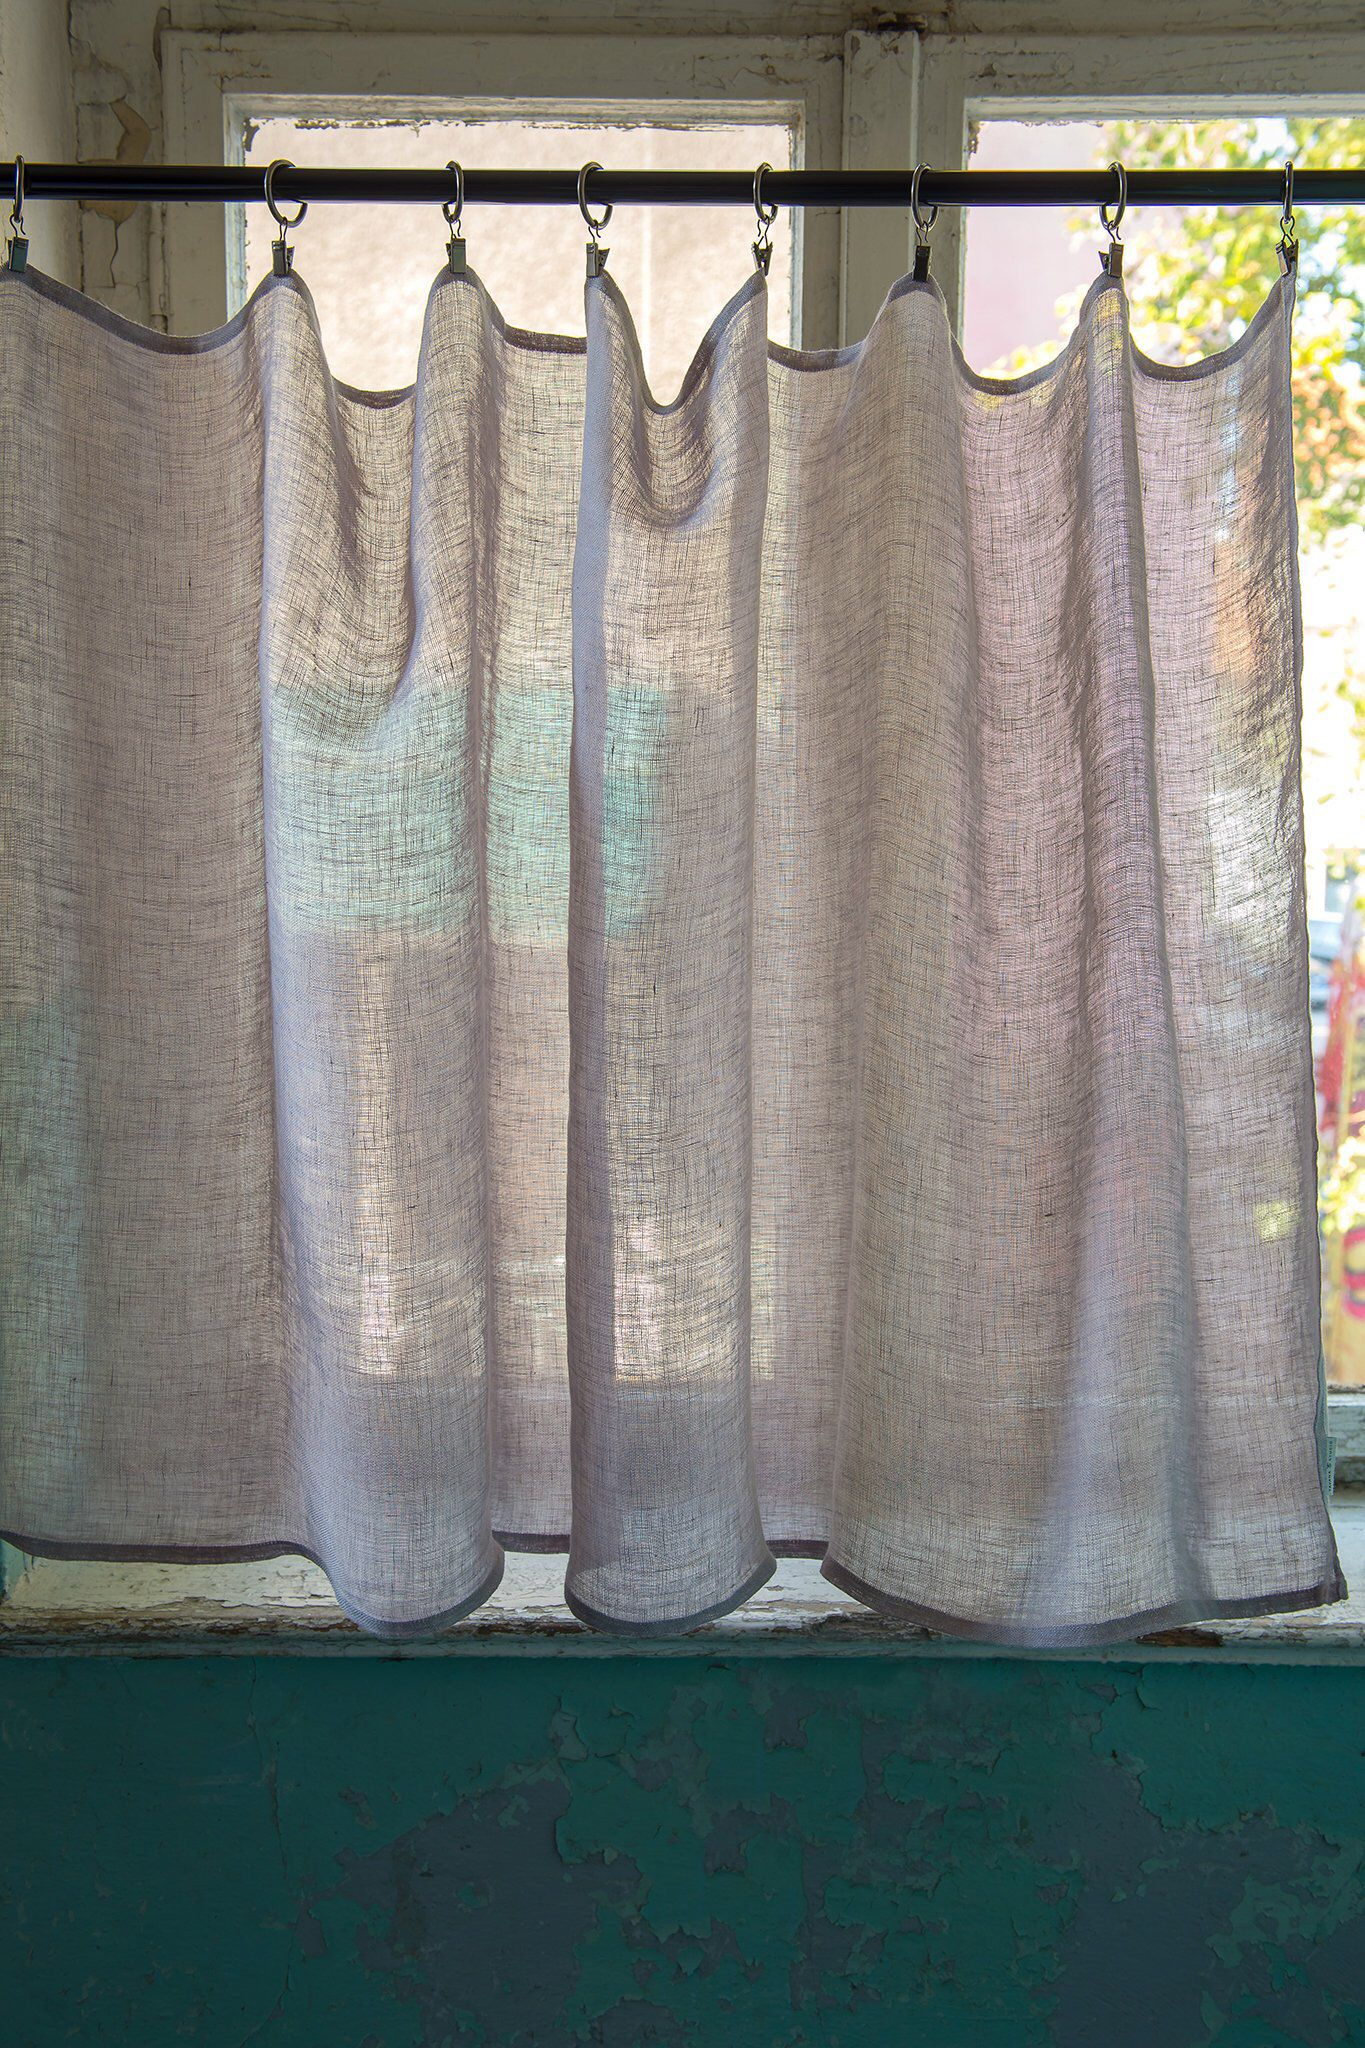 Lniana Delikatna Firana Zazdrostki Do Kuchni Zaslonki Do Kuchni Lniane Firanki Do Kuchni Z Lnu Biale Lniane Zaslony Do Kuchni Cafe Curtains Curtains Bathroom Windows